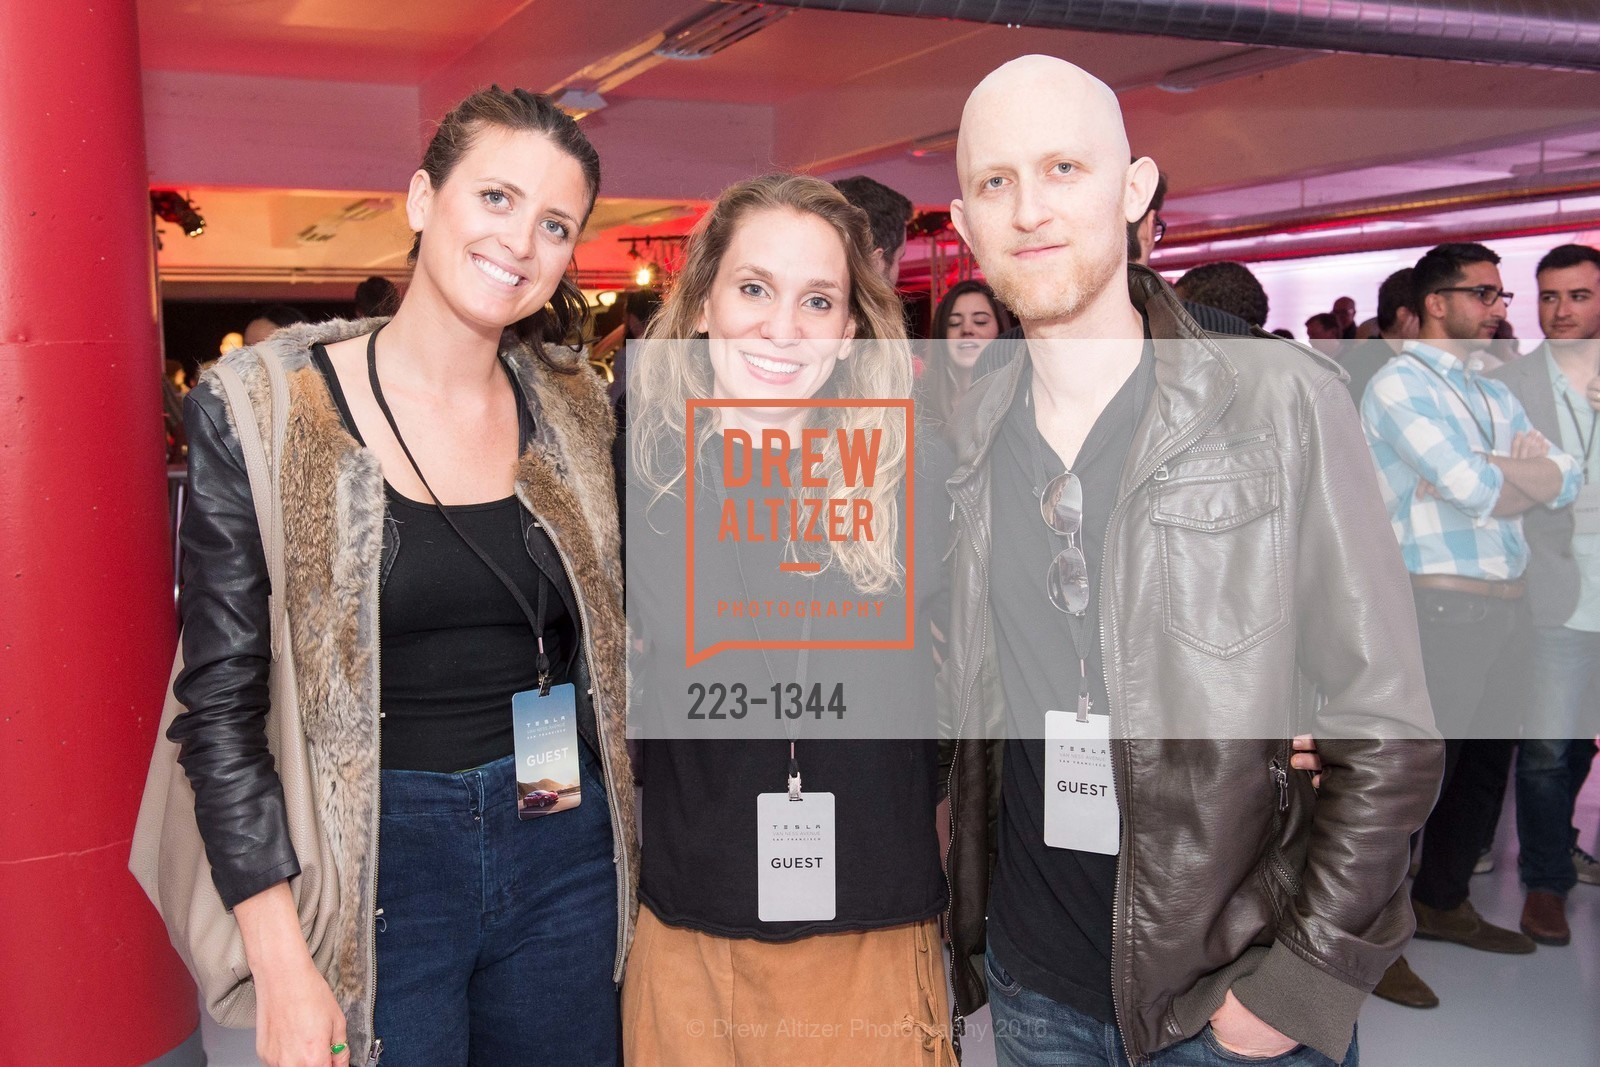 Isabelle De Laperouse, Elizabeth Louro, George Ban-Weiss, Photo #223-1344